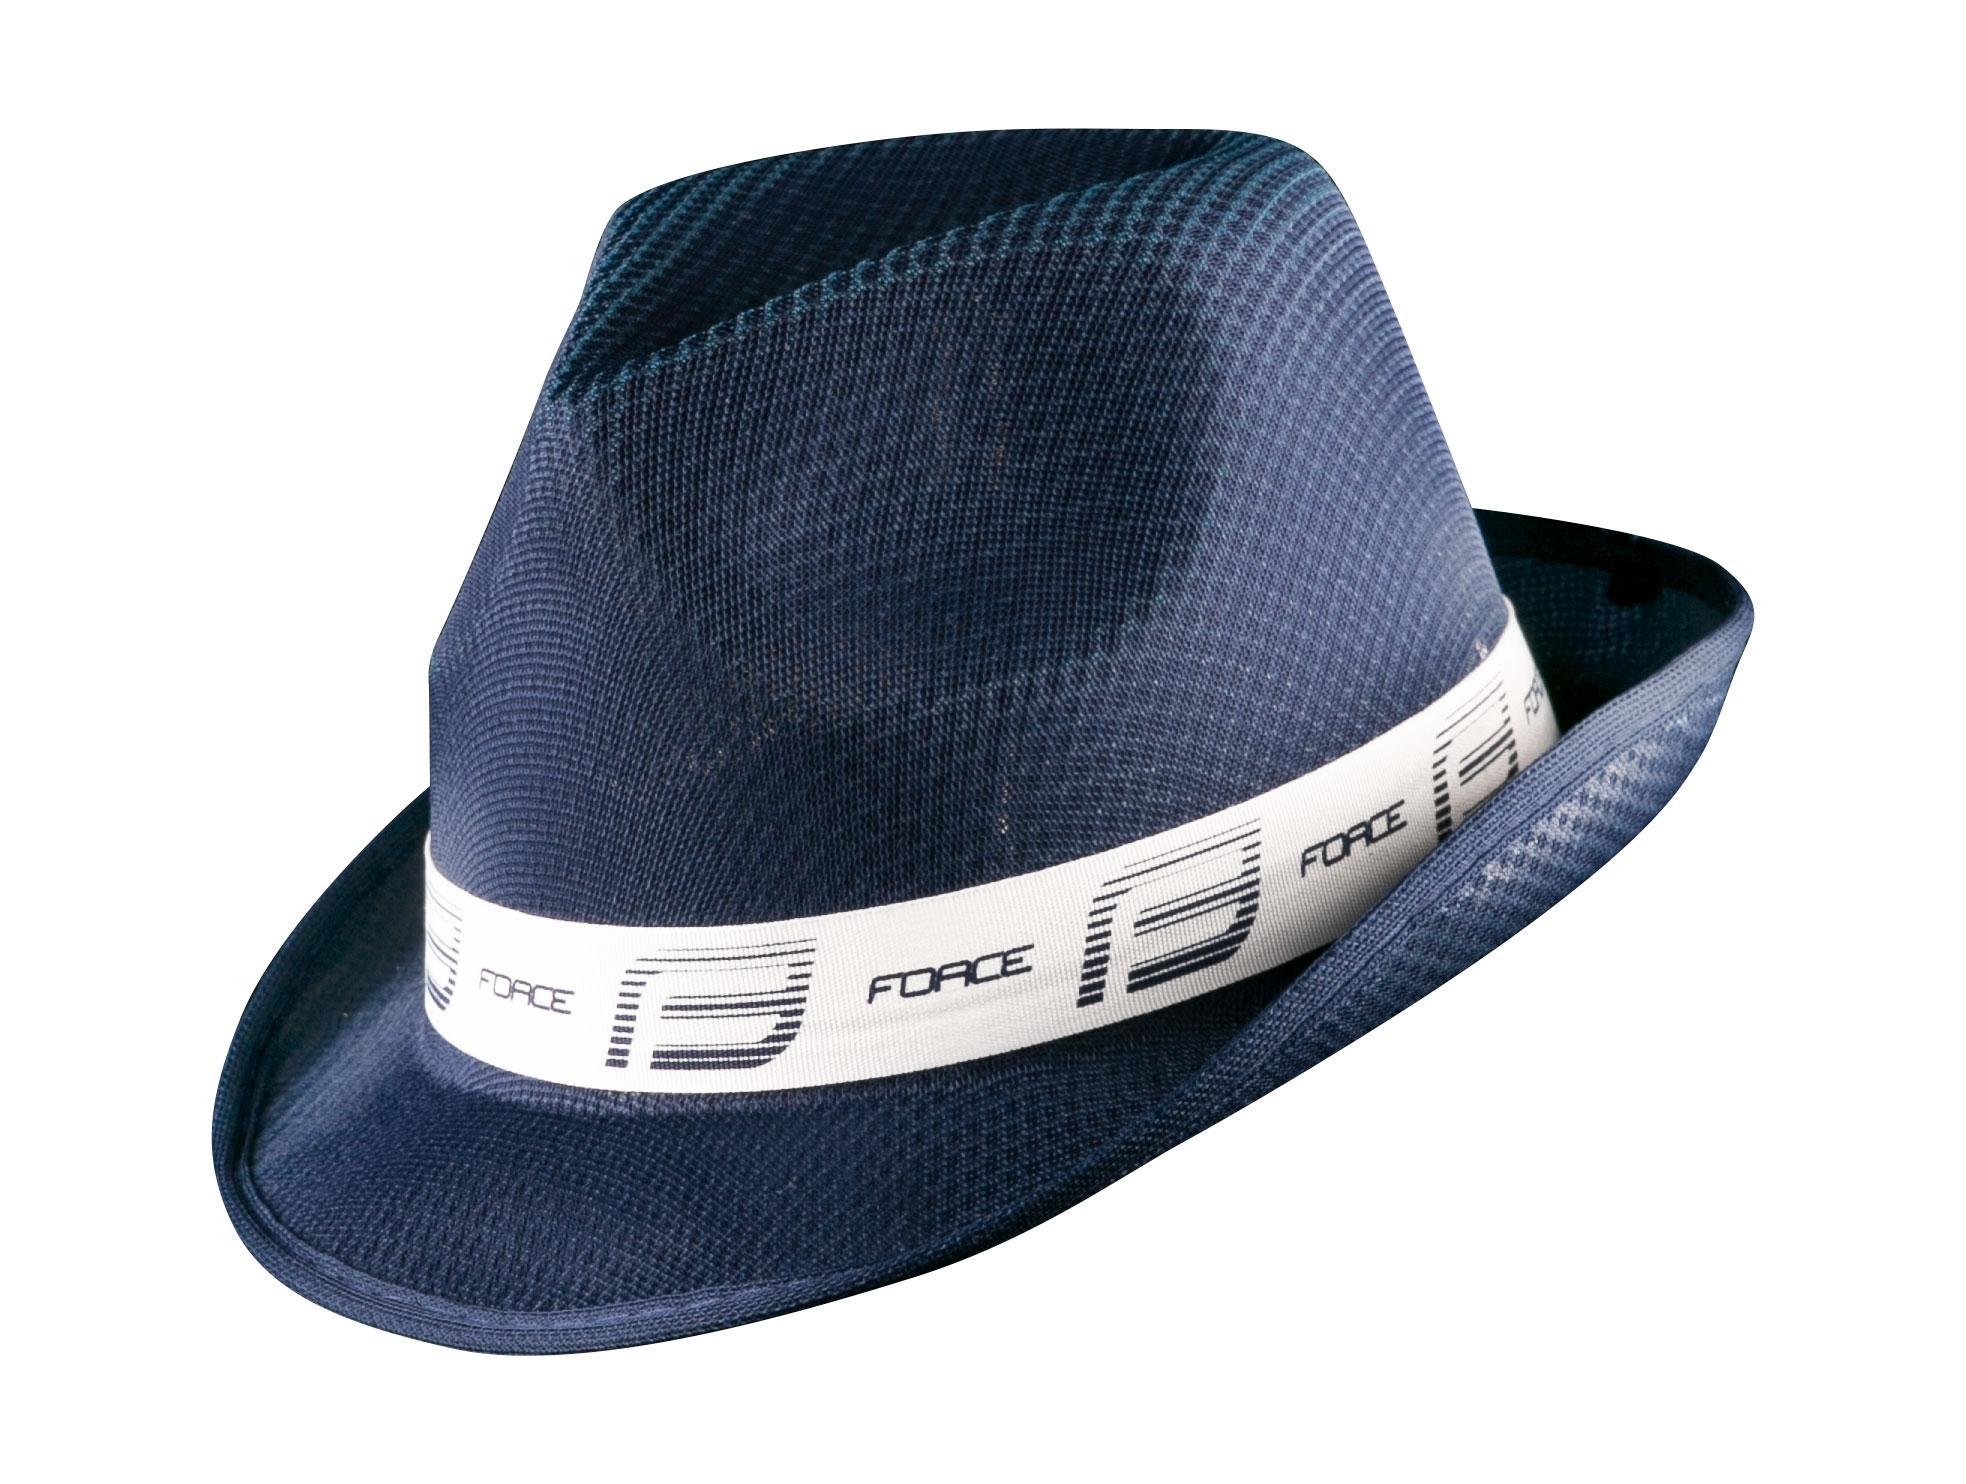 klobouk FORCE PANAMA, modro-bílý